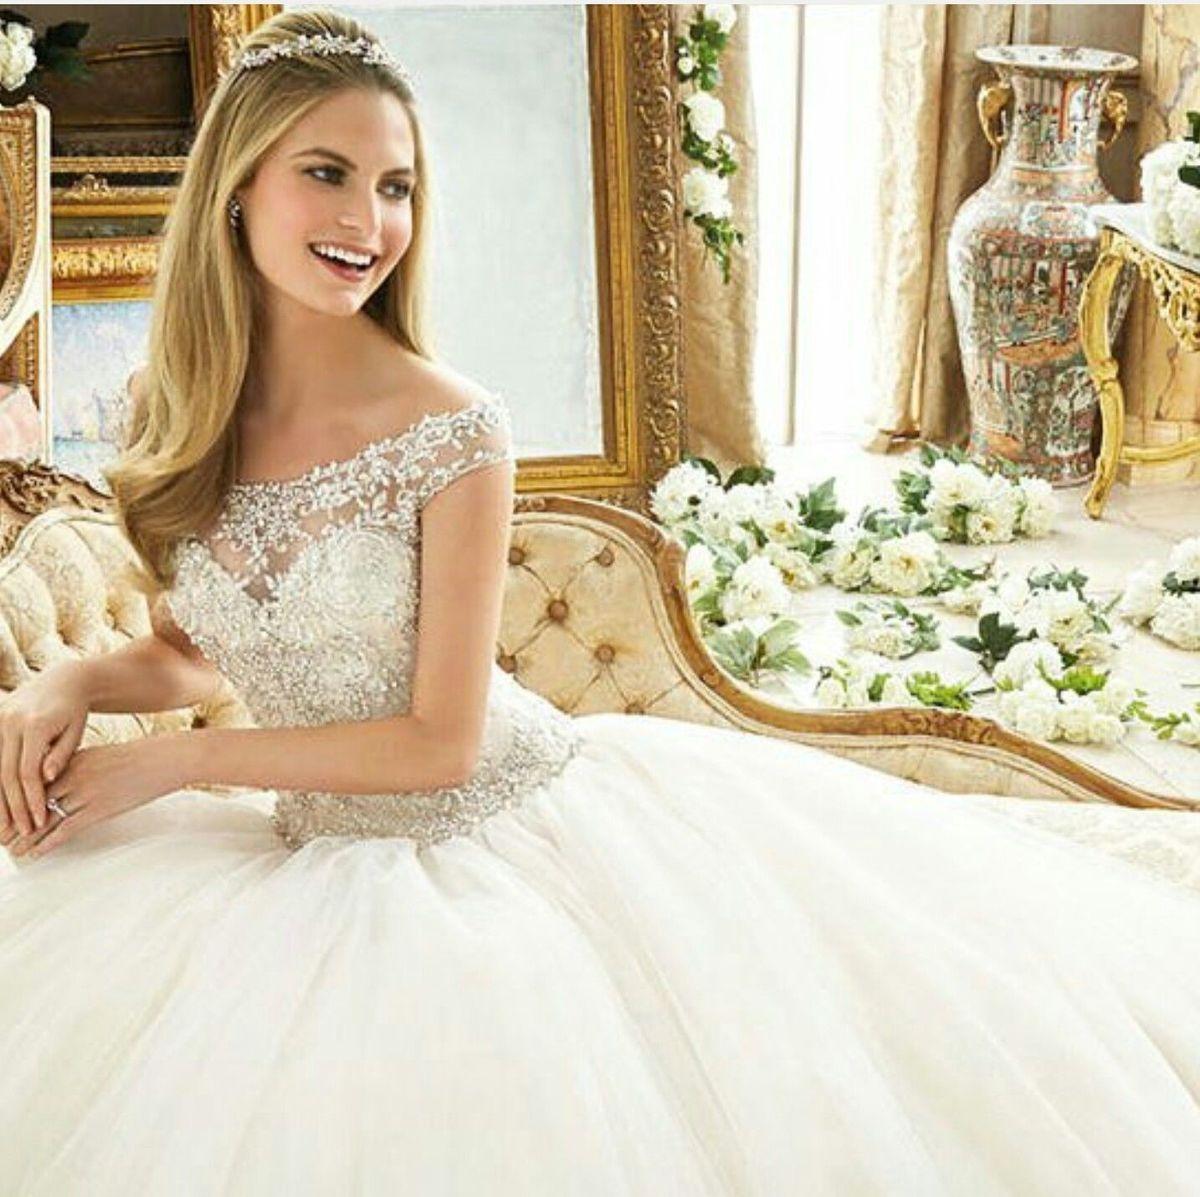 100+ Wedding Dresses Inland Empire - Best Shapewear for Wedding ...